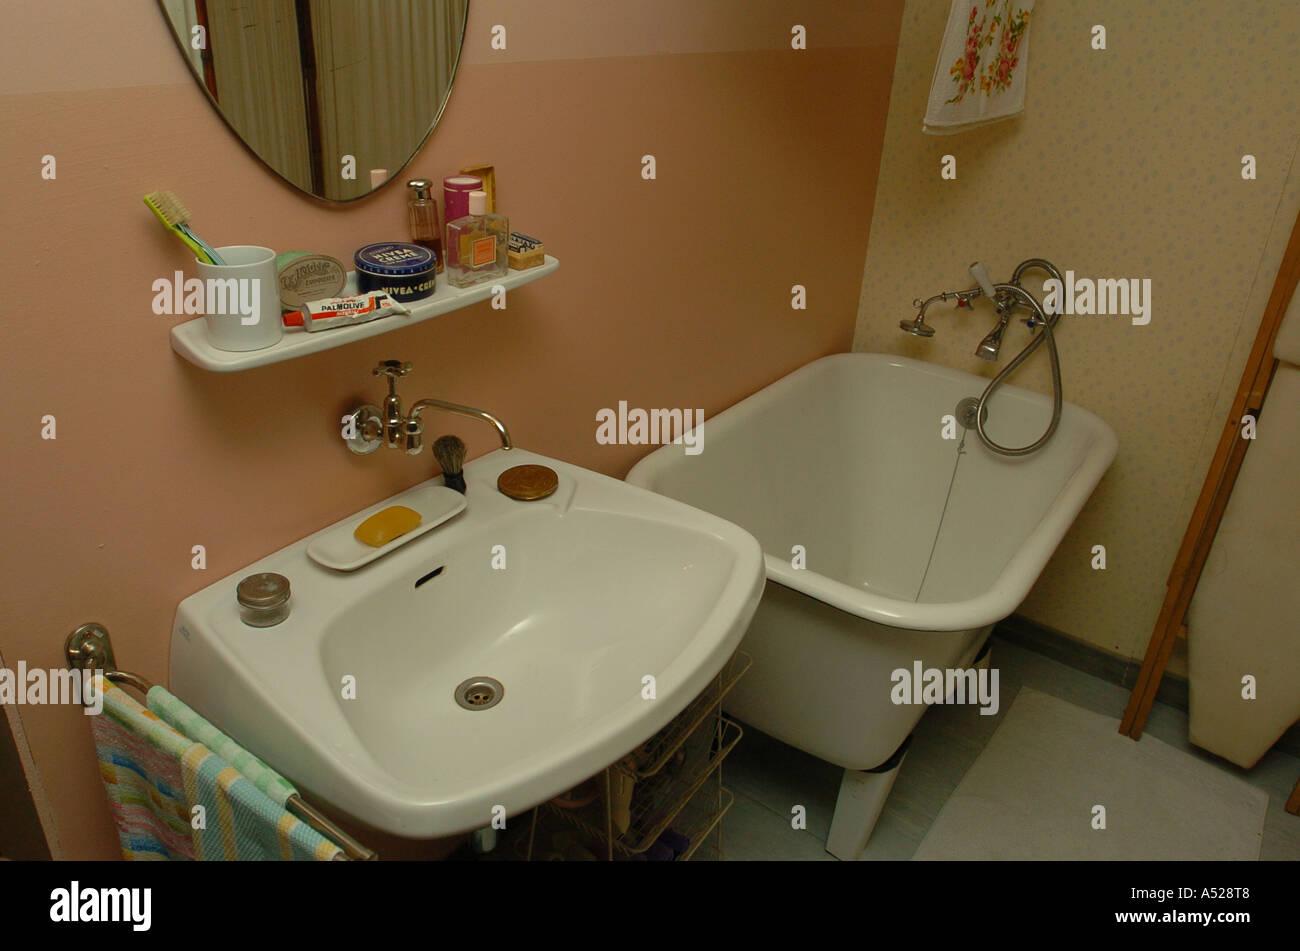 apartment in 50s style bathroom Stock Photo: 6384775 - Alamy